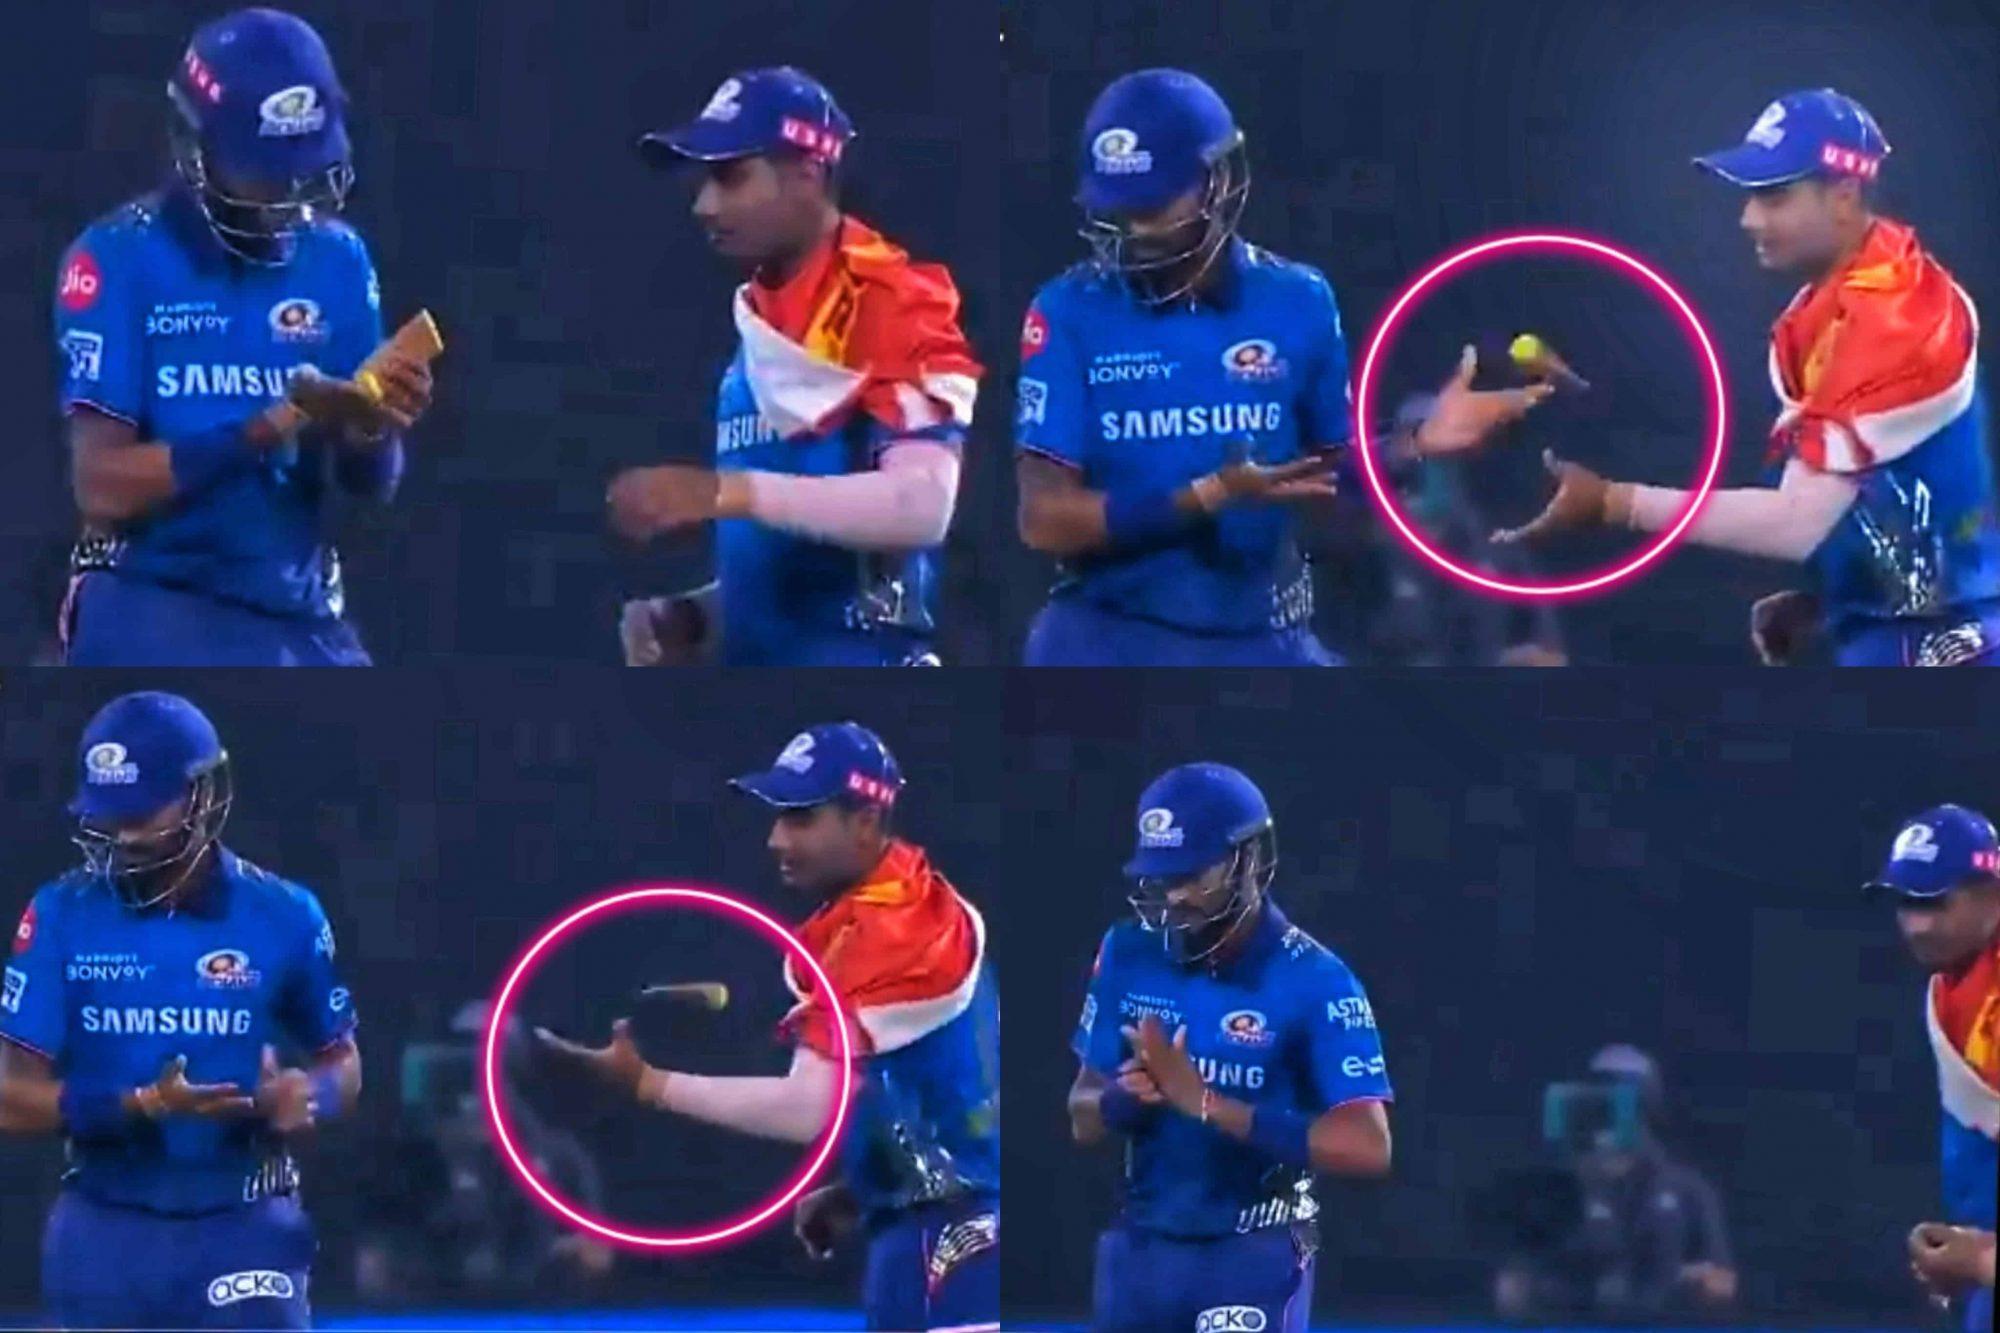 Watch: Krunal Pandya Misbehaved During MI vs RR; Throws Away The Moisturizer Towards Anukul Roy